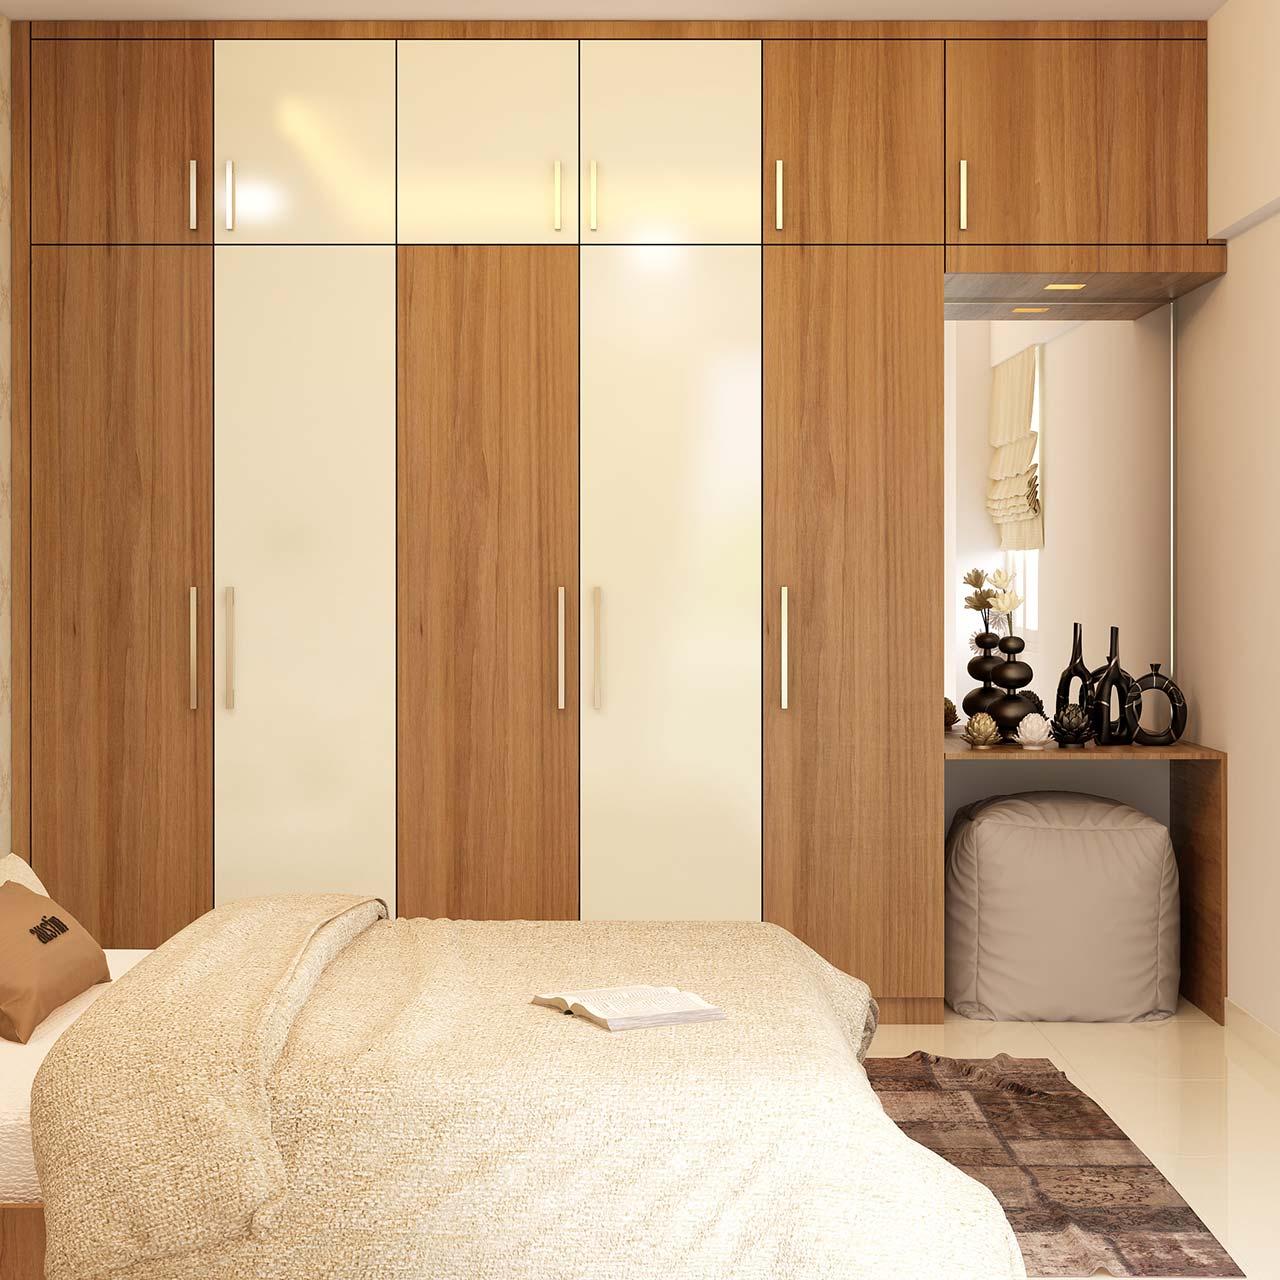 Bedroom Interior Design Checklist  Guides  Design Cafe